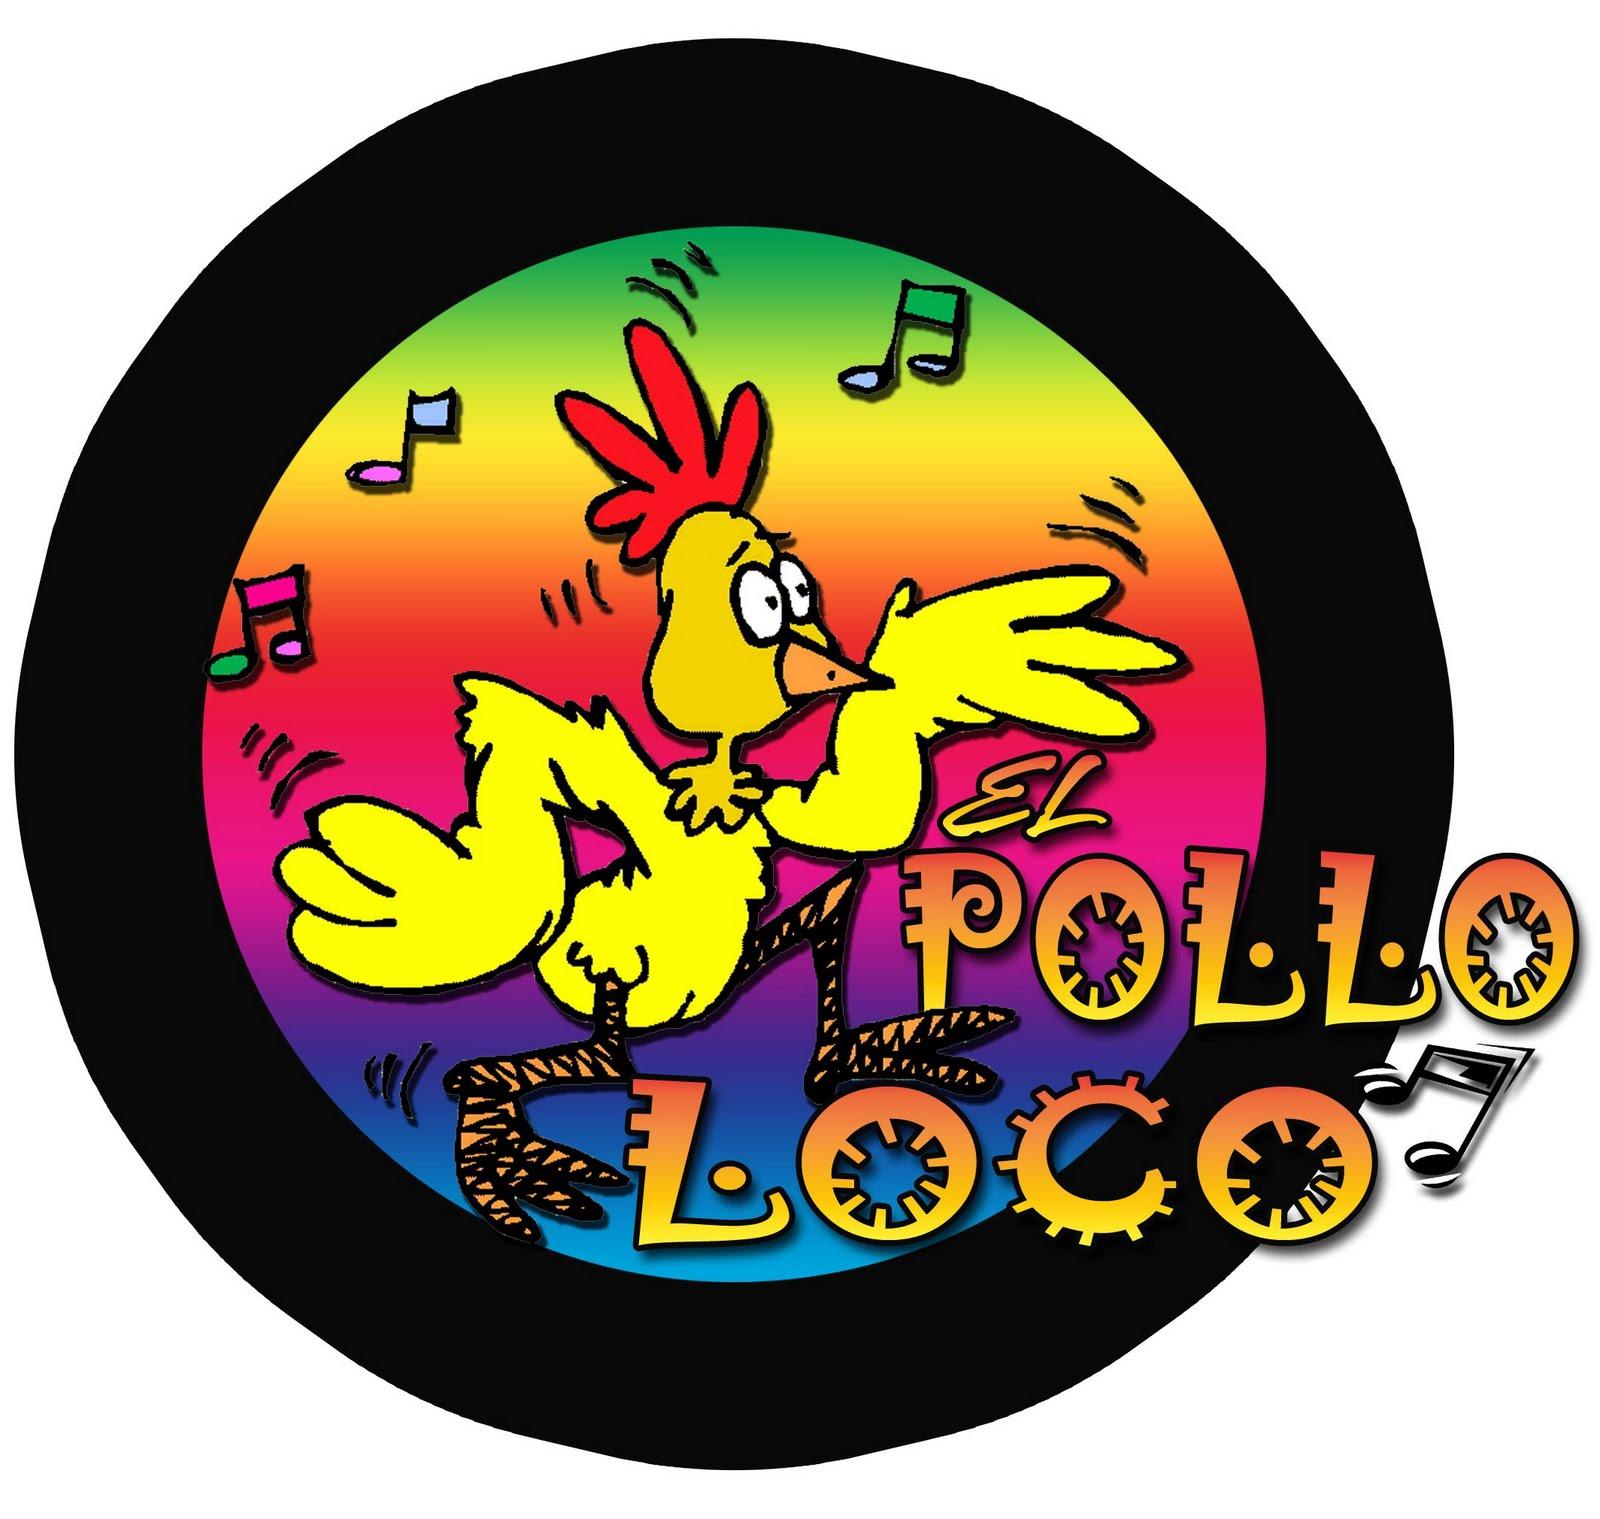 El Pollo Loco Logo ritzie's fashion insight: el pollo loco!